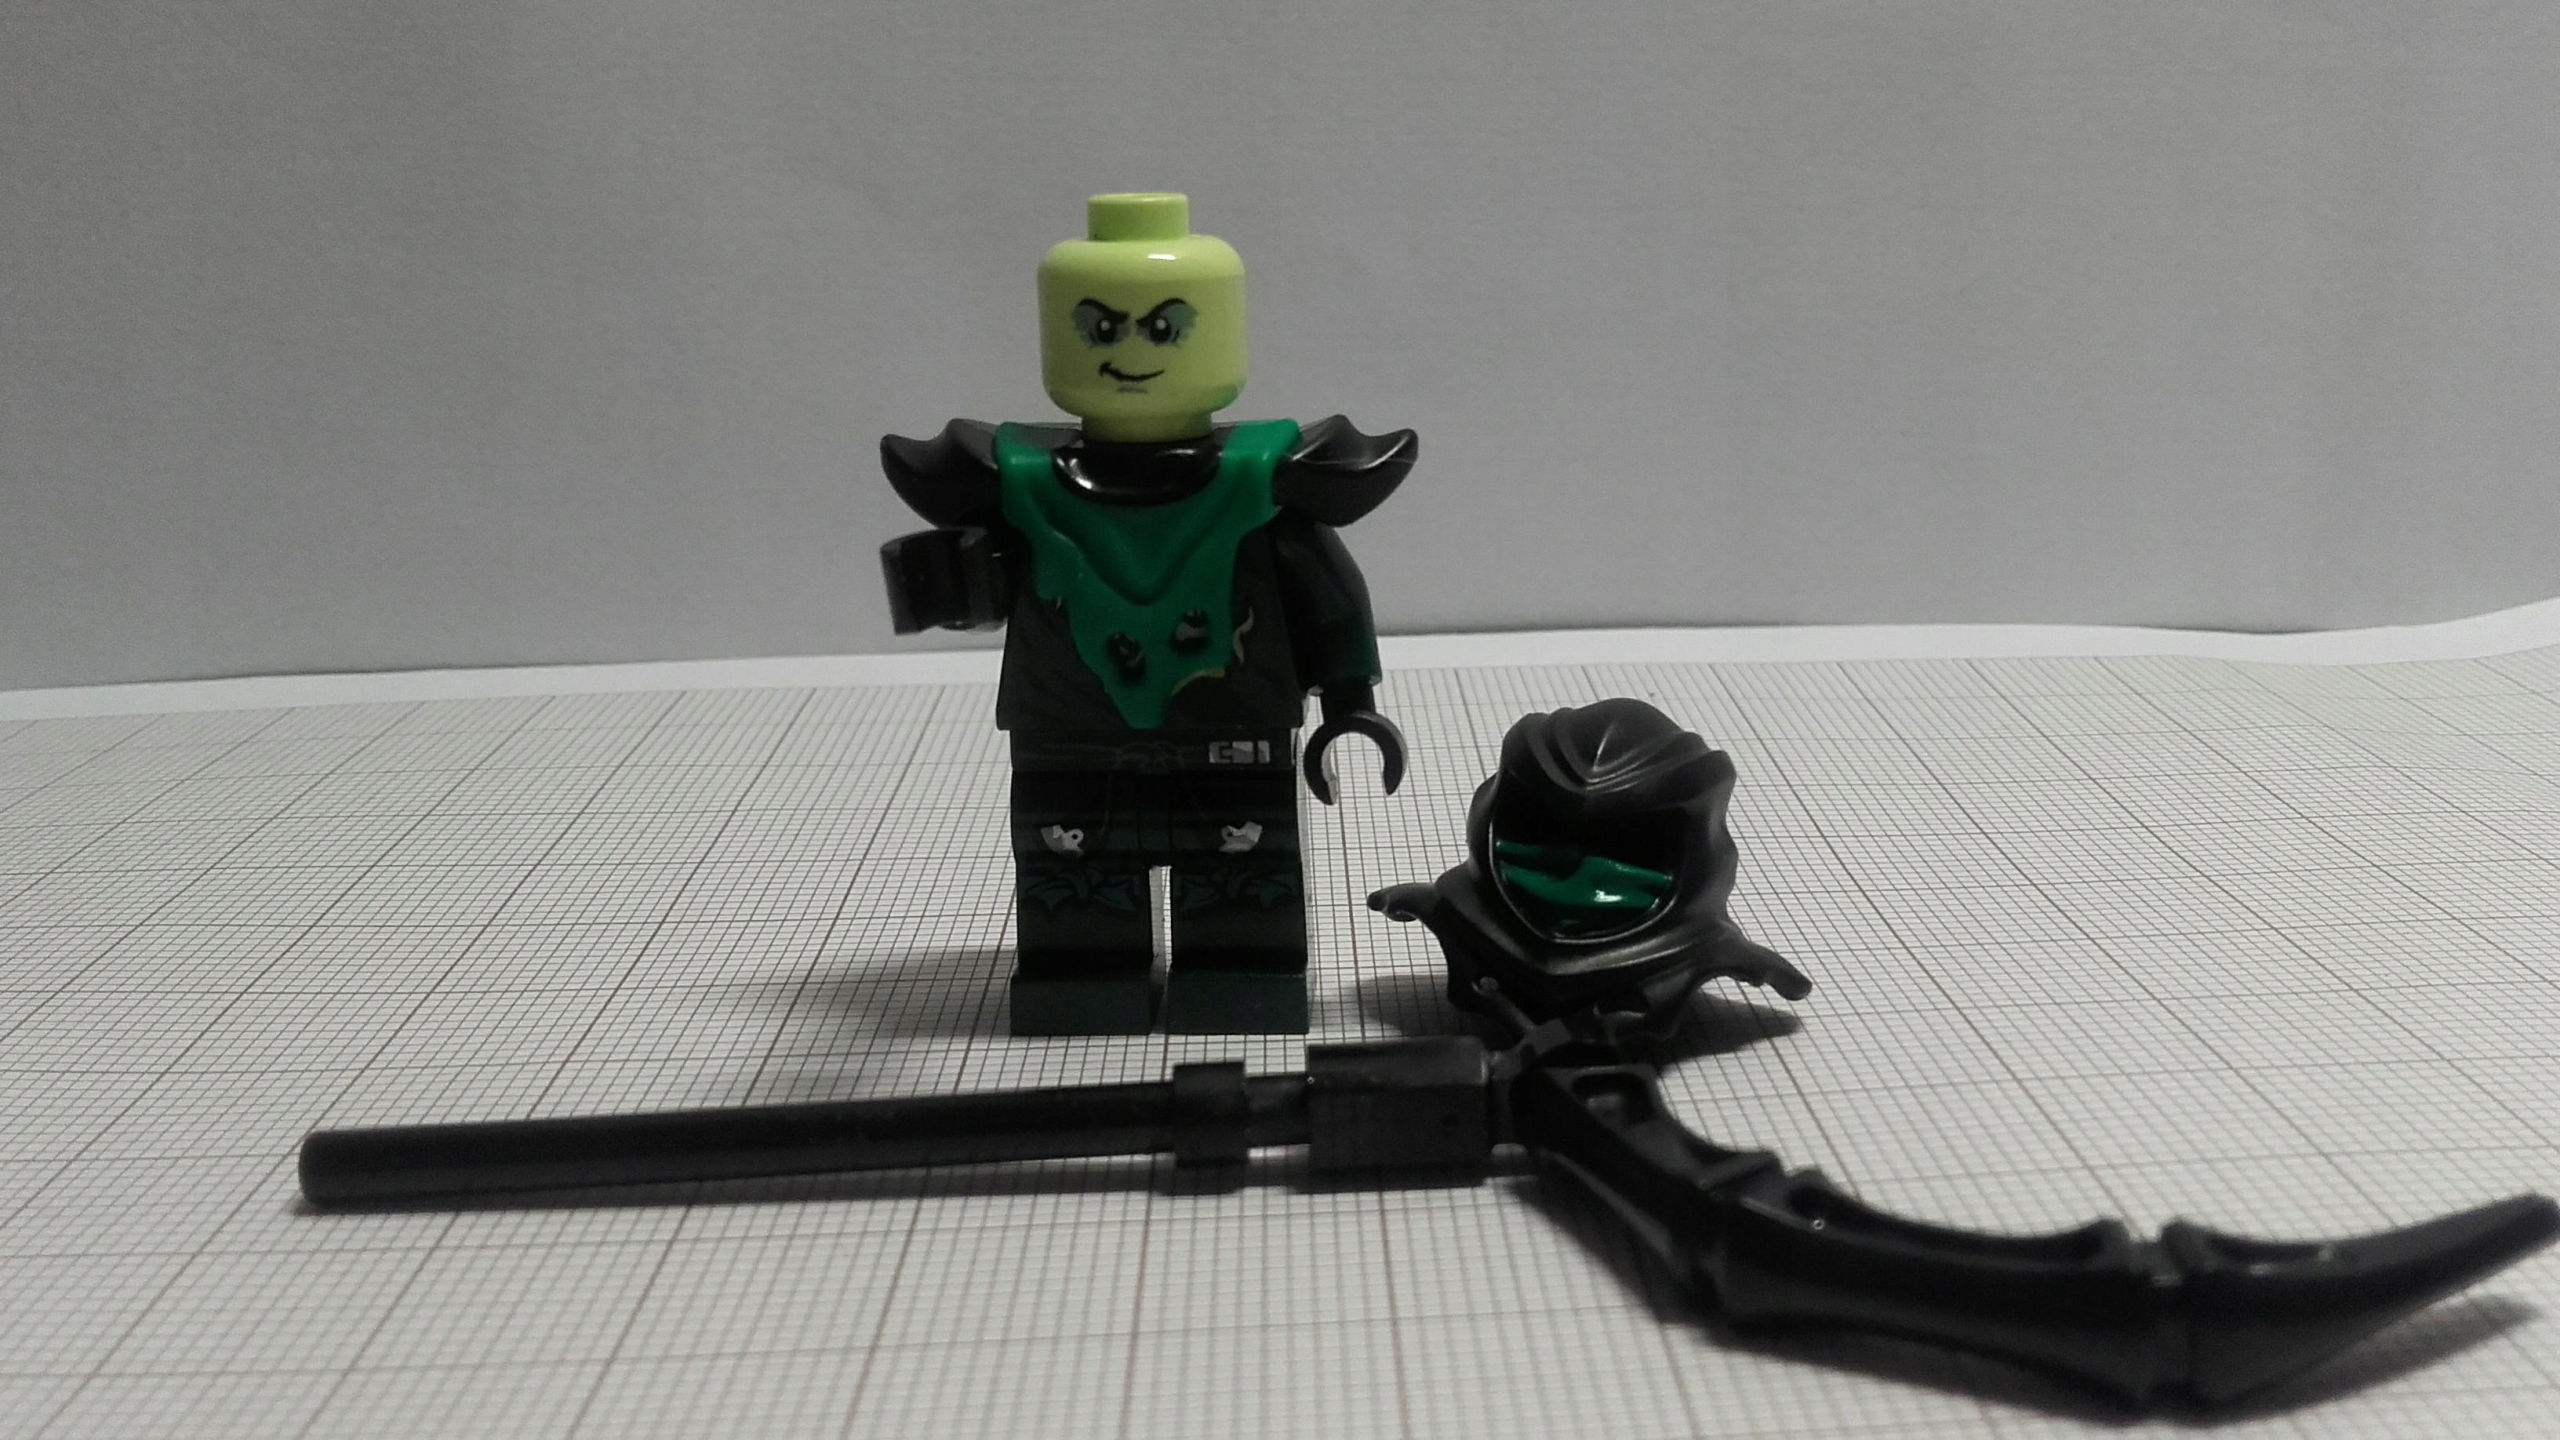 Lego Ninjago Evil Green Ninja Njo154 70736 7656292264